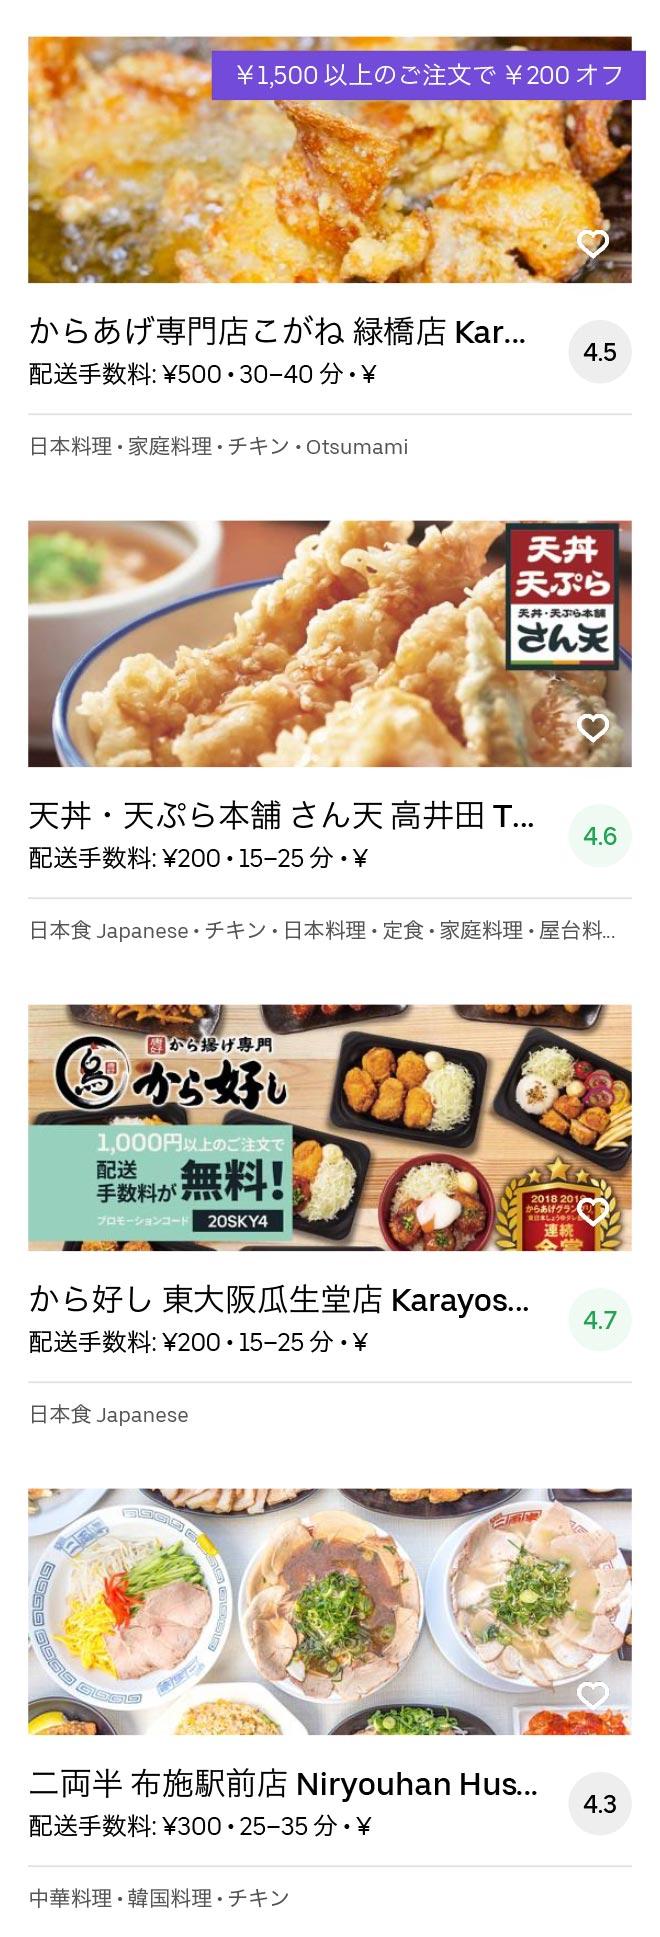 Higashi osaka nagata menu 2005 12